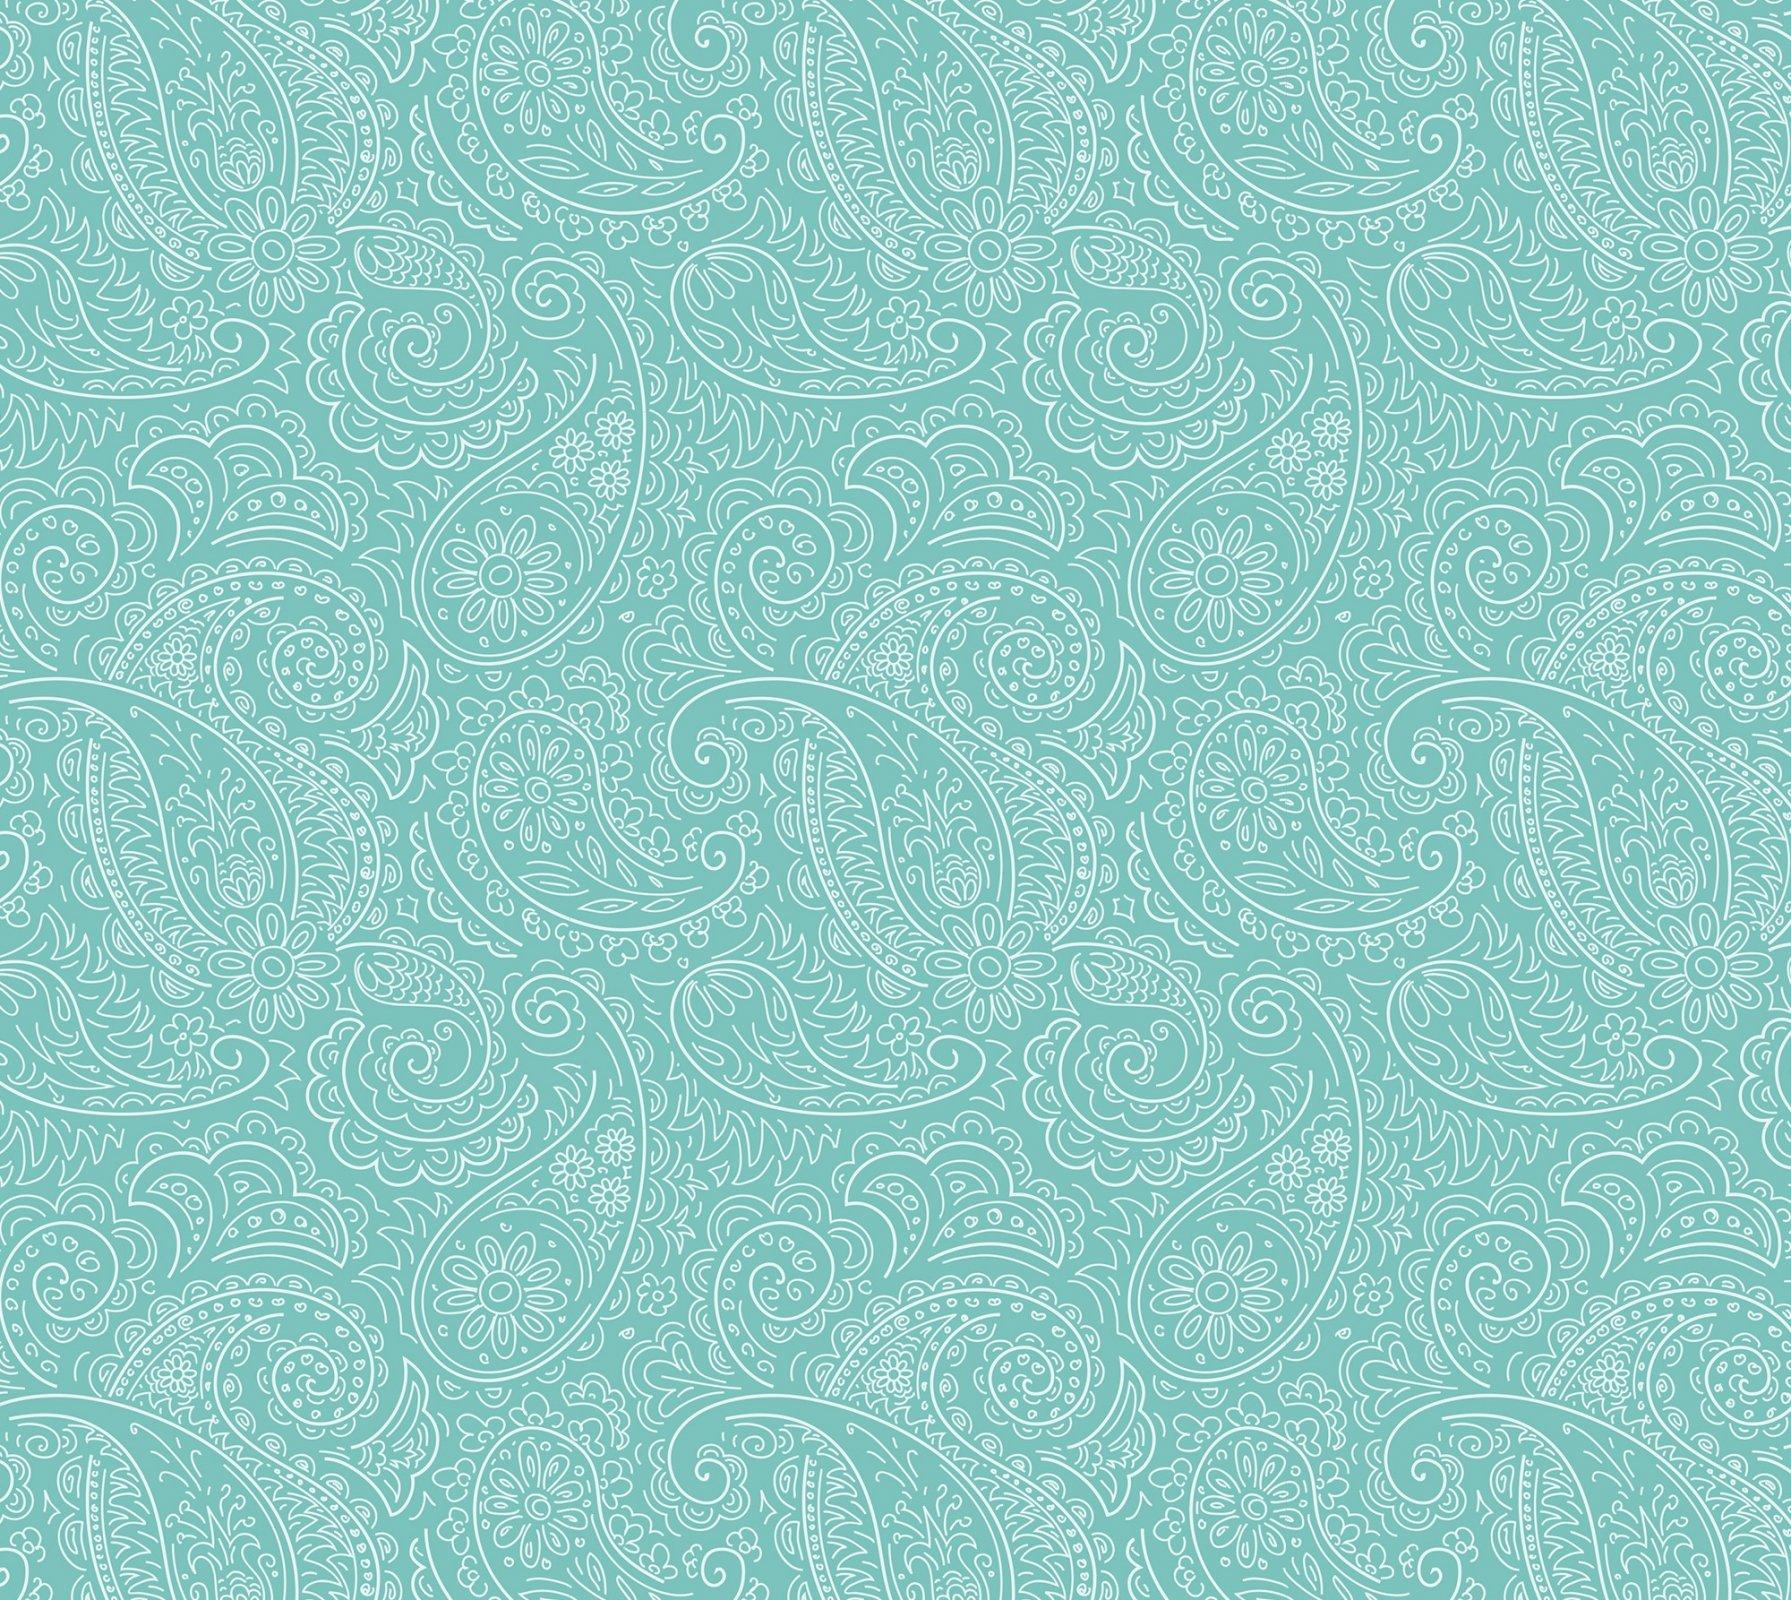 DT-Prima Meadows DX-1784-0C-1 Turquoise - Drawn Paisley